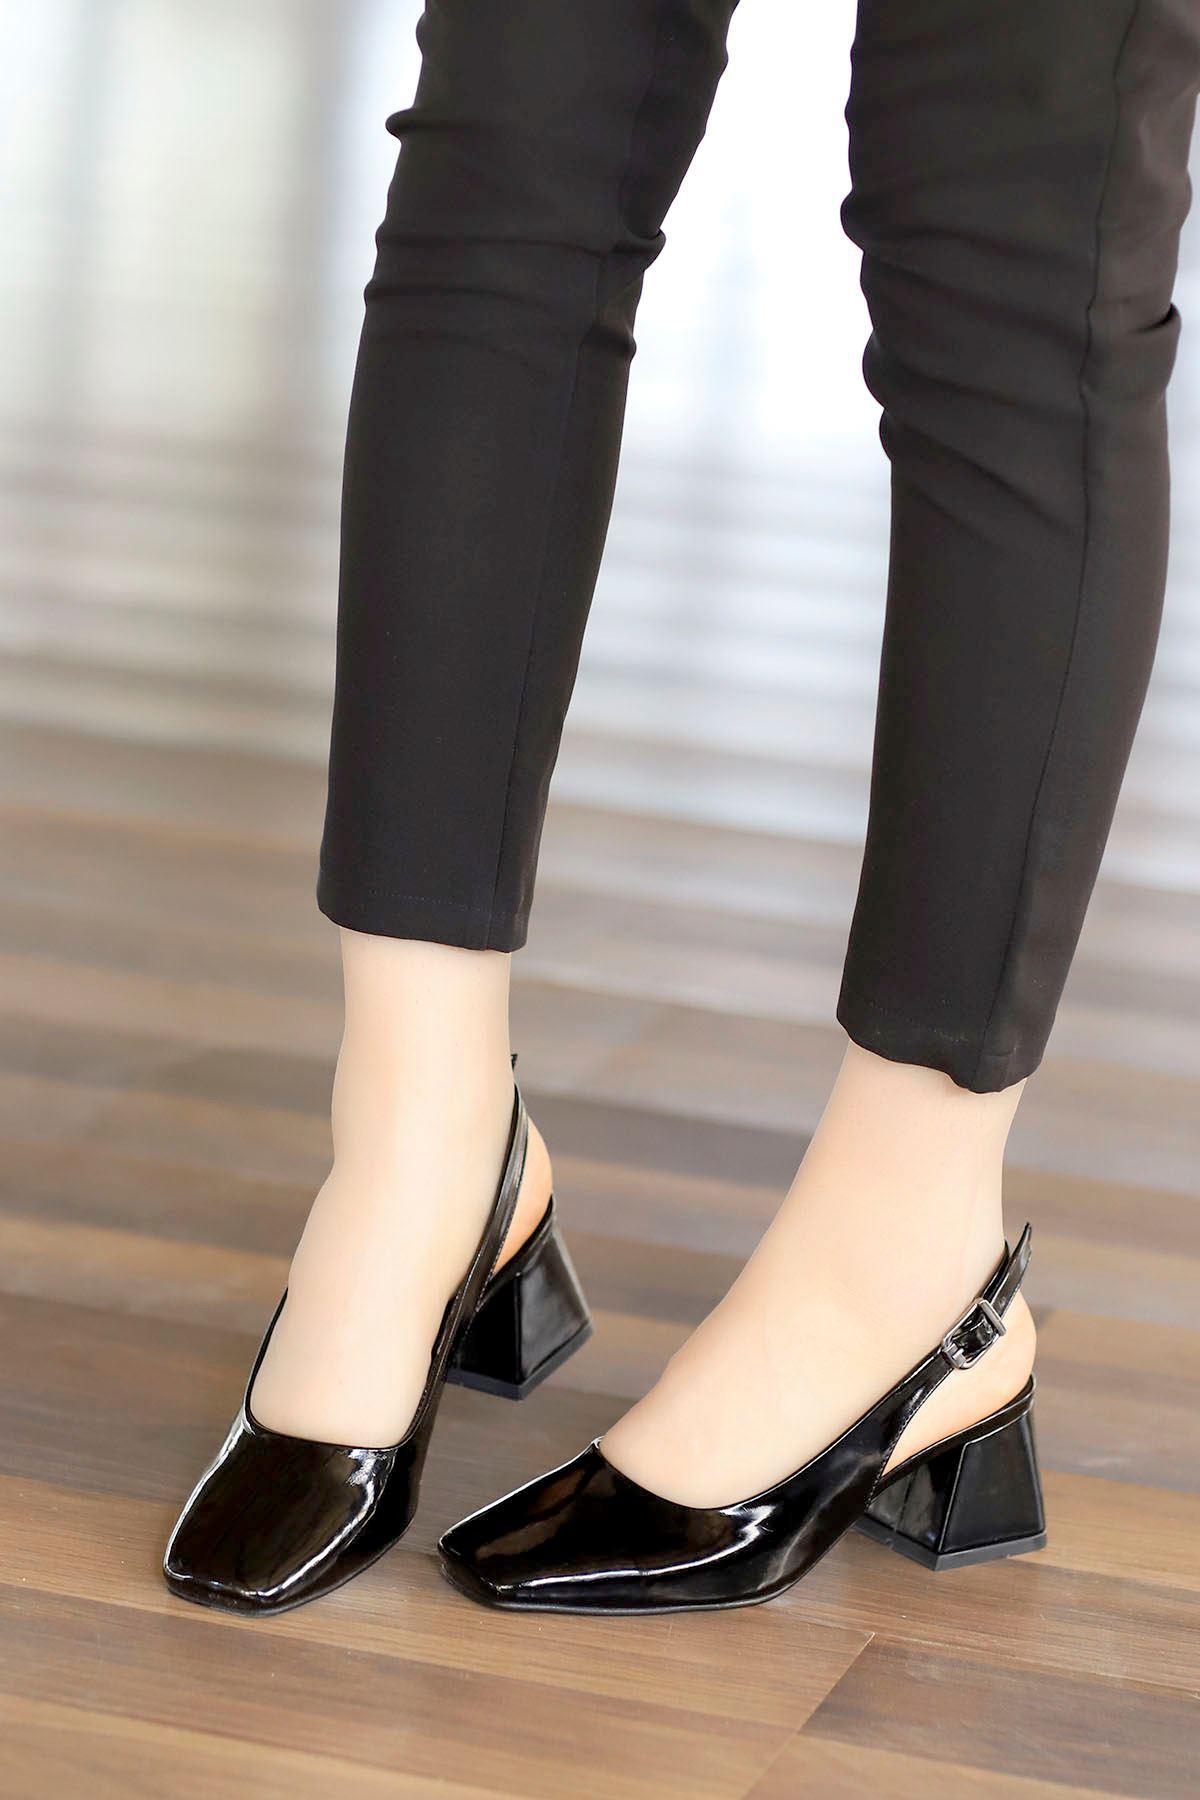 Mabel Arka Açık Topuklu Ayakkabı Siyah Rugan